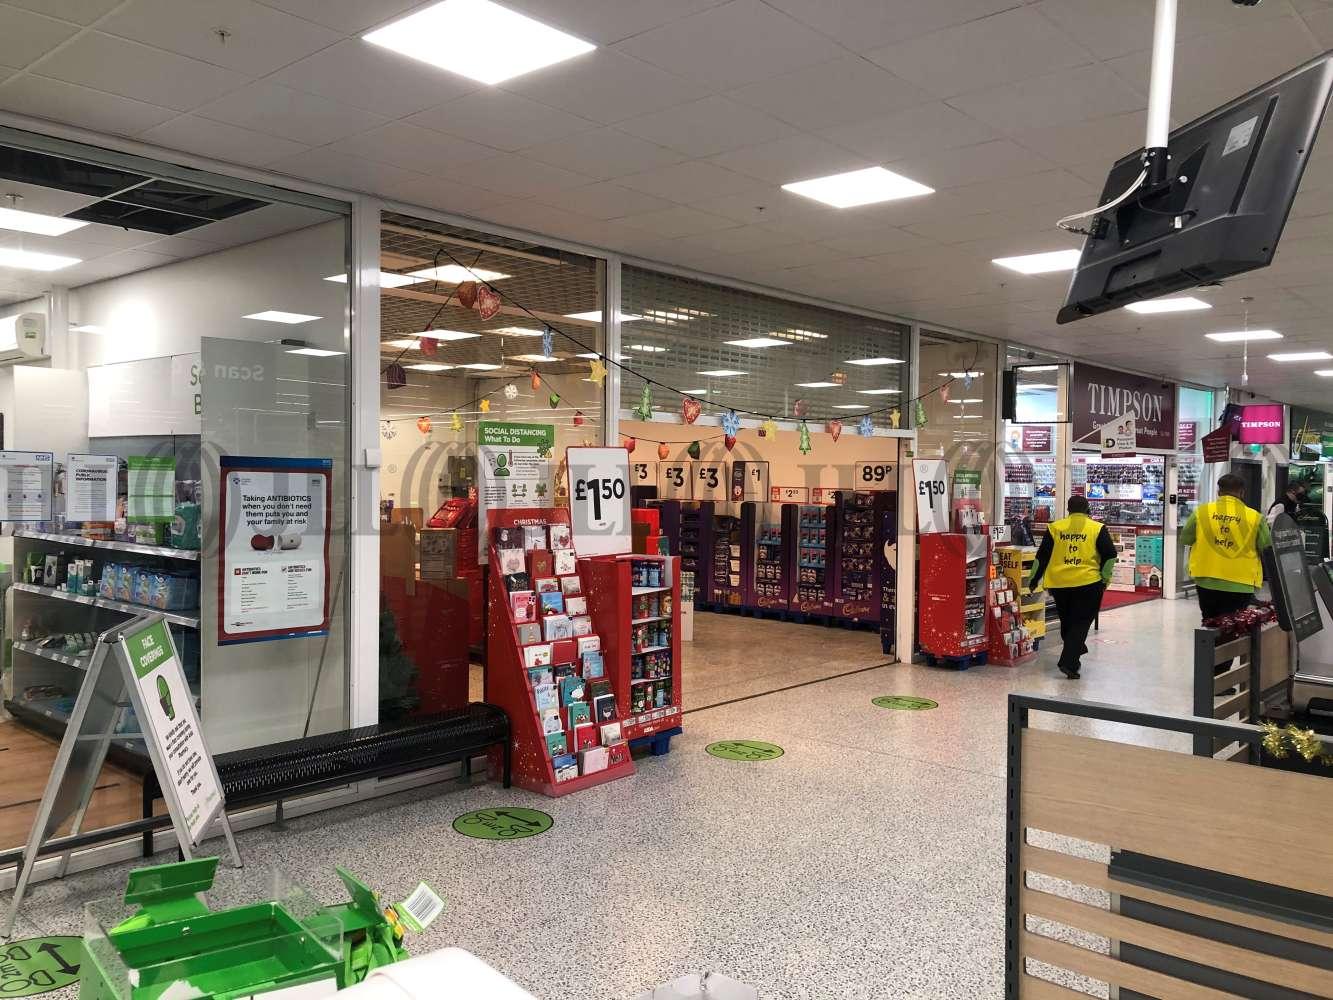 Retail shopping centre Aberdeen, portlethen, AB12 4XP - ASDA Portlethen